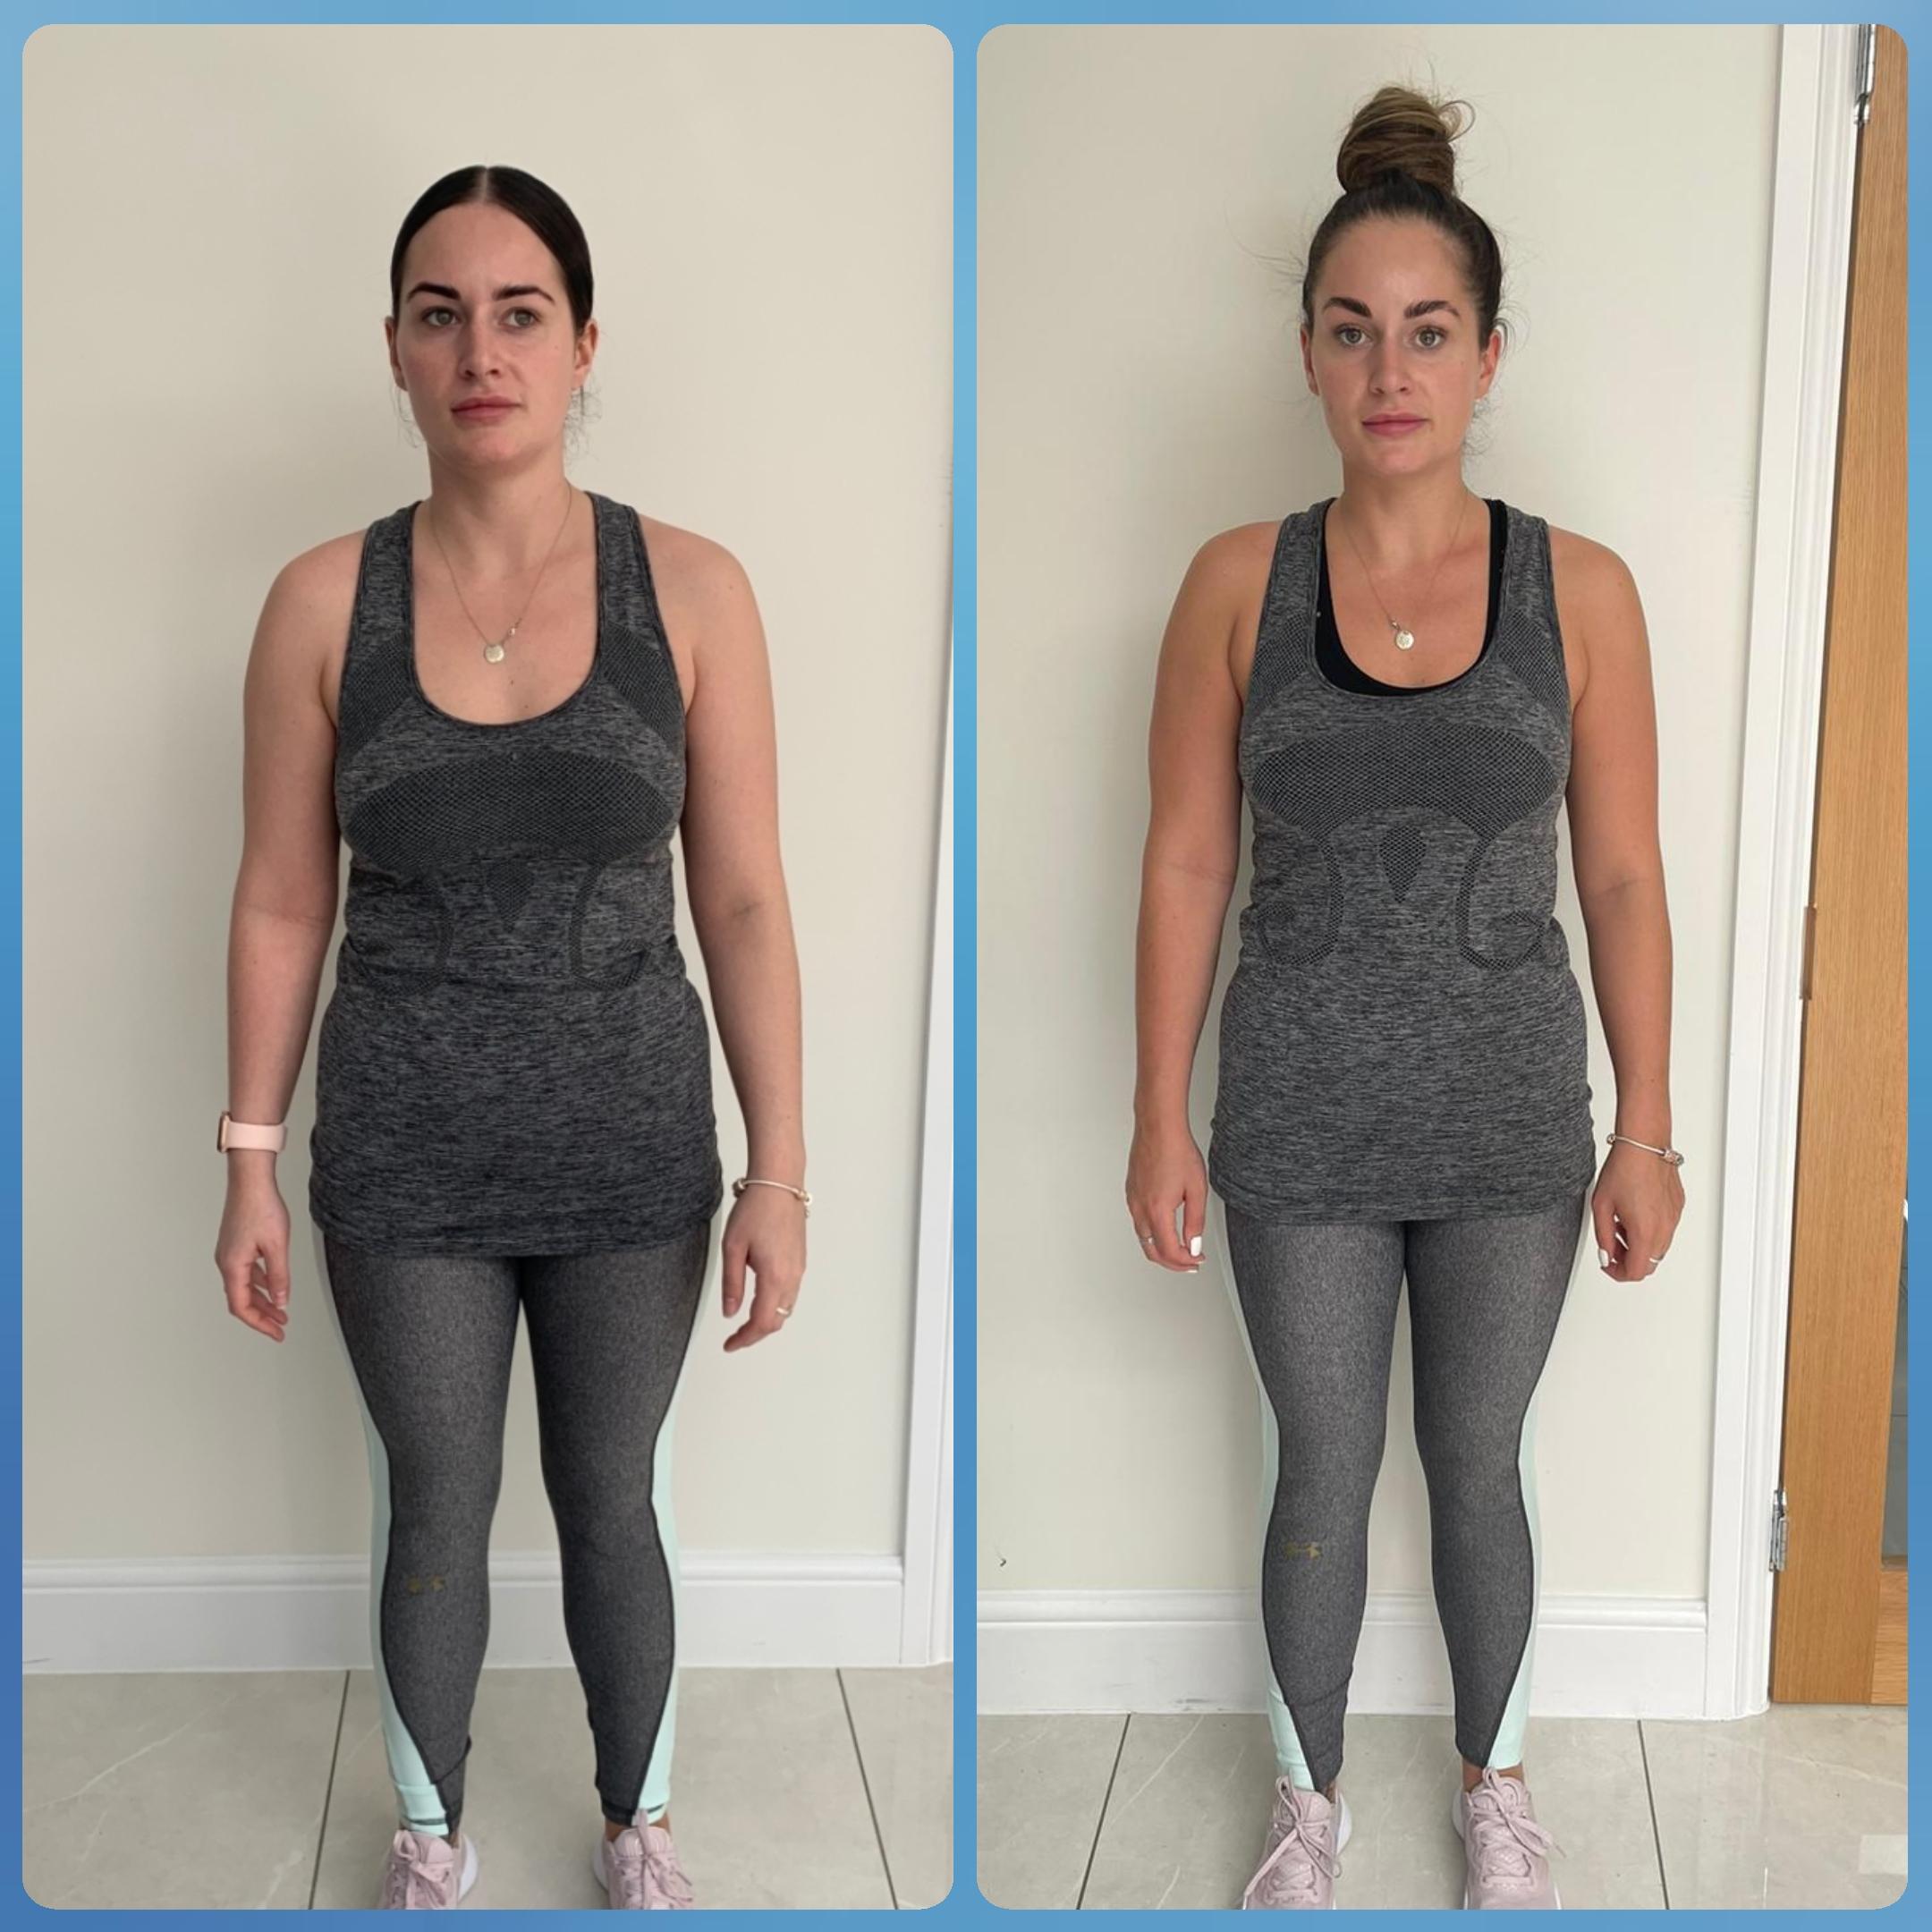 Kiera 12 week transformation 3